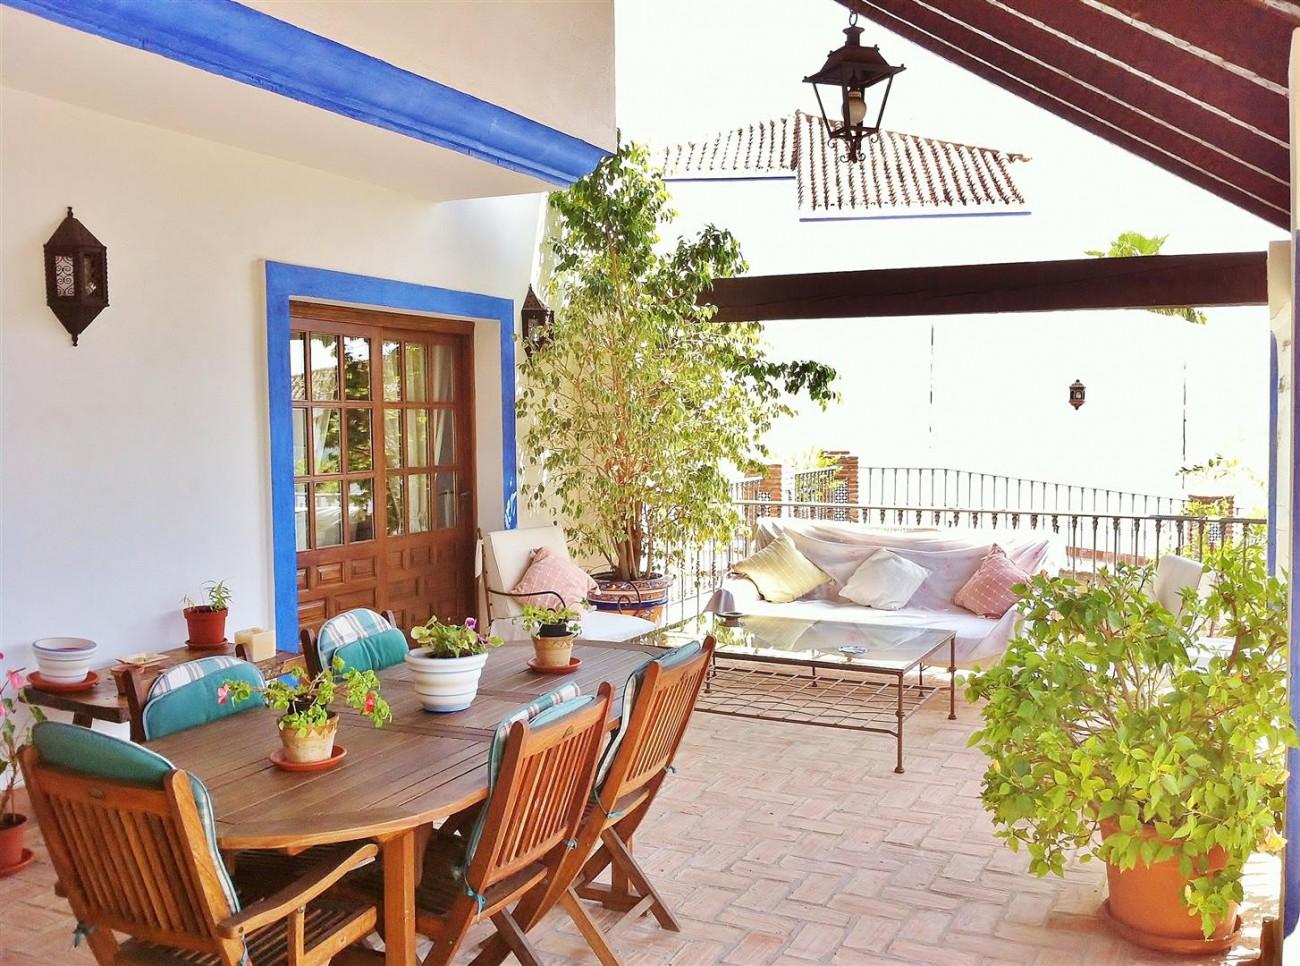 Rustic Villa for sale Estepona Spain (9) (Large)